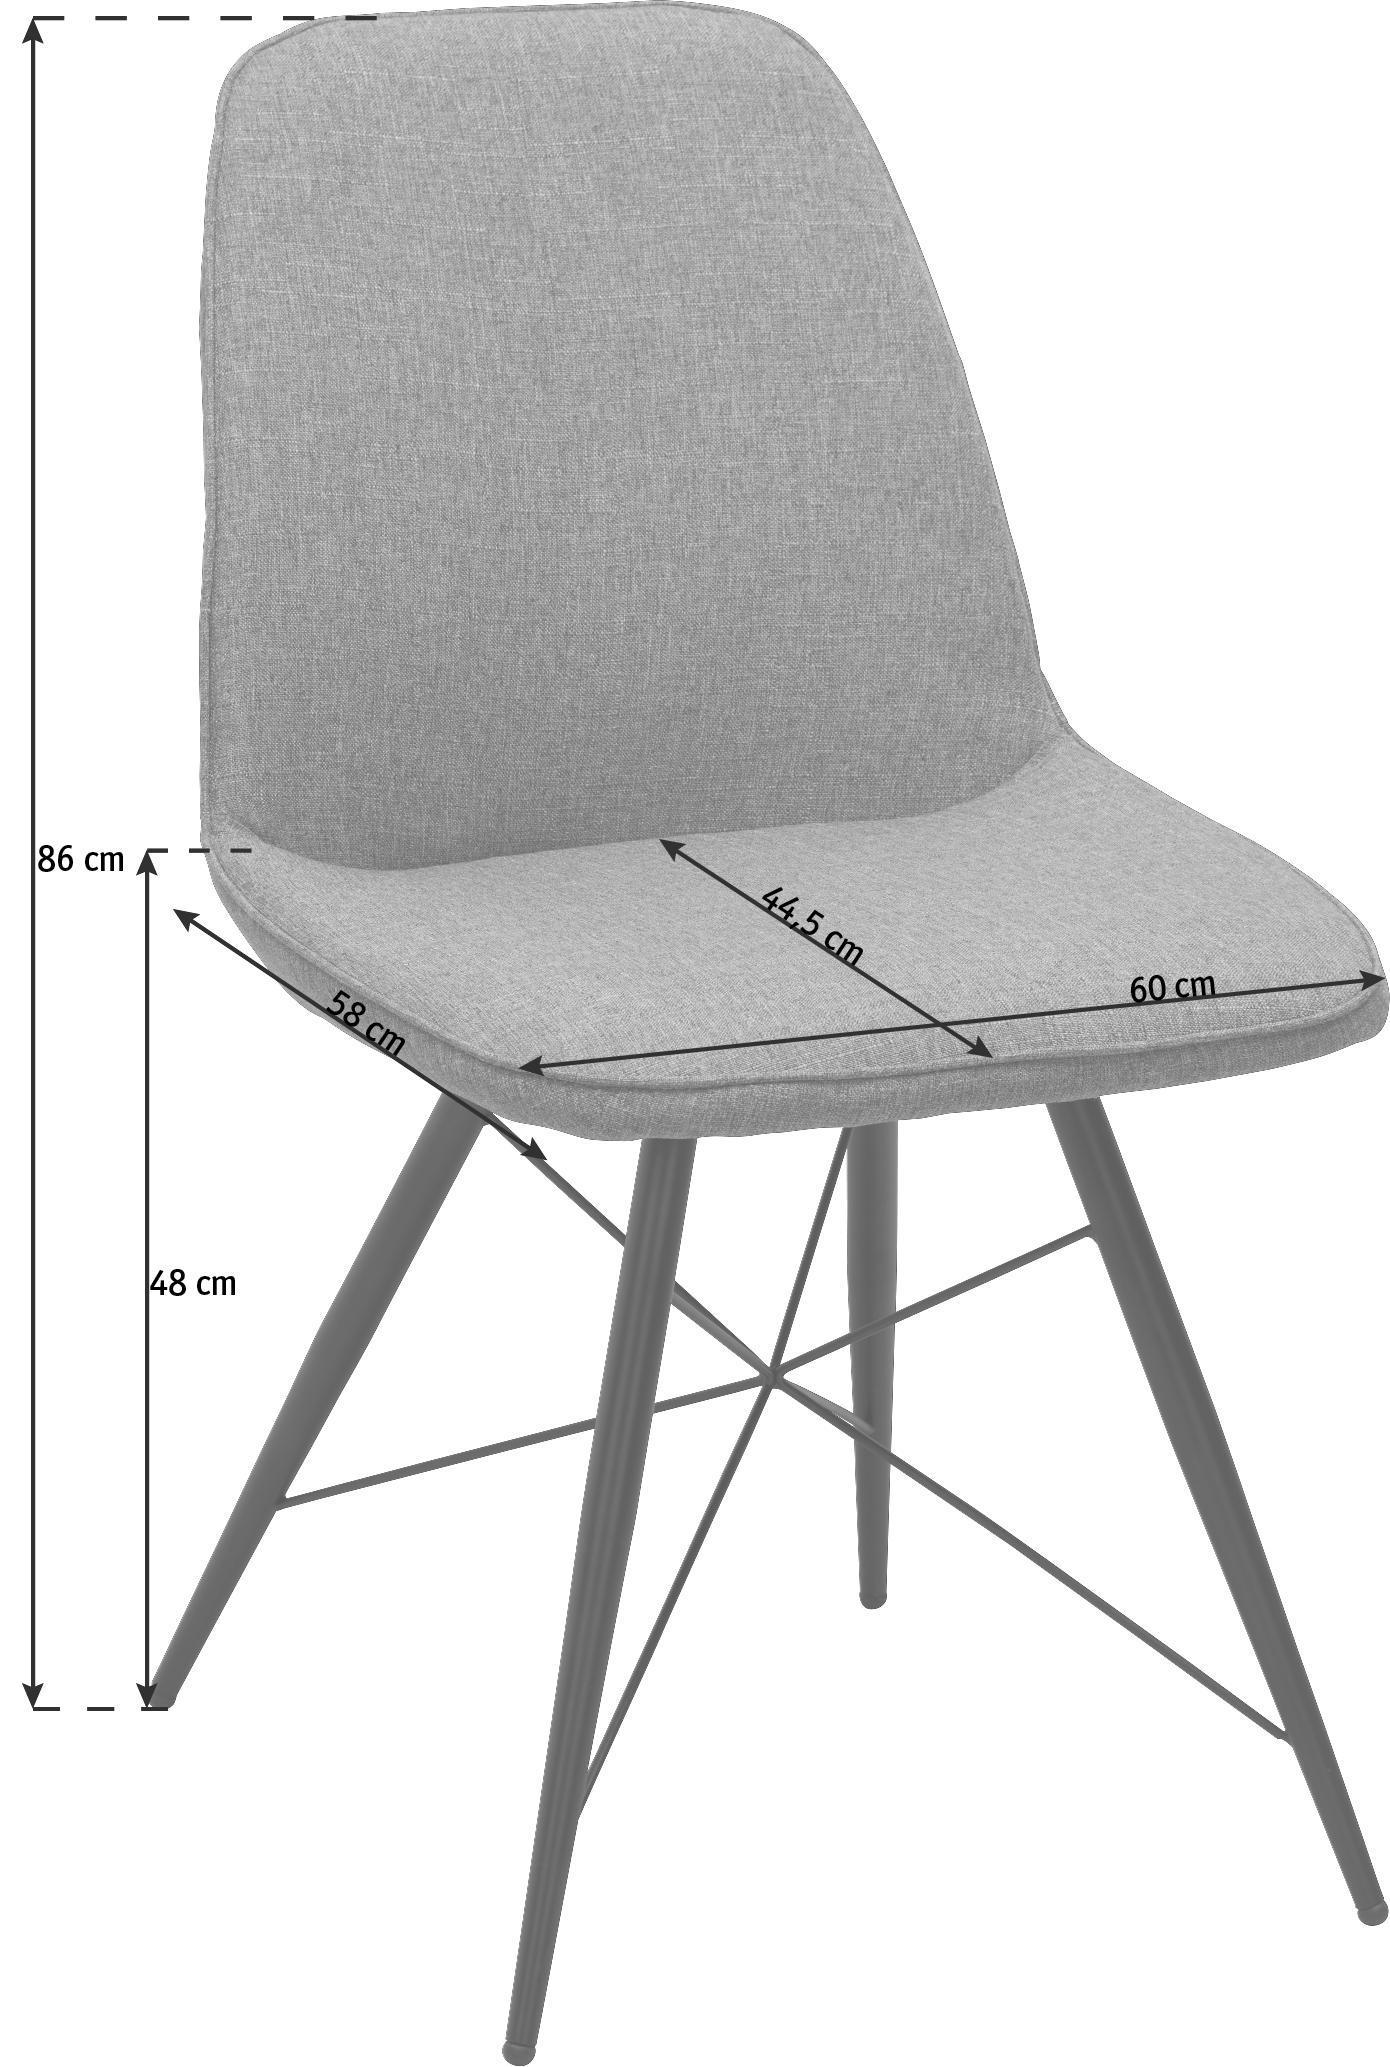 STOL - grön/svart, Design, metall/textil (60/86/58cm) - Carryhome